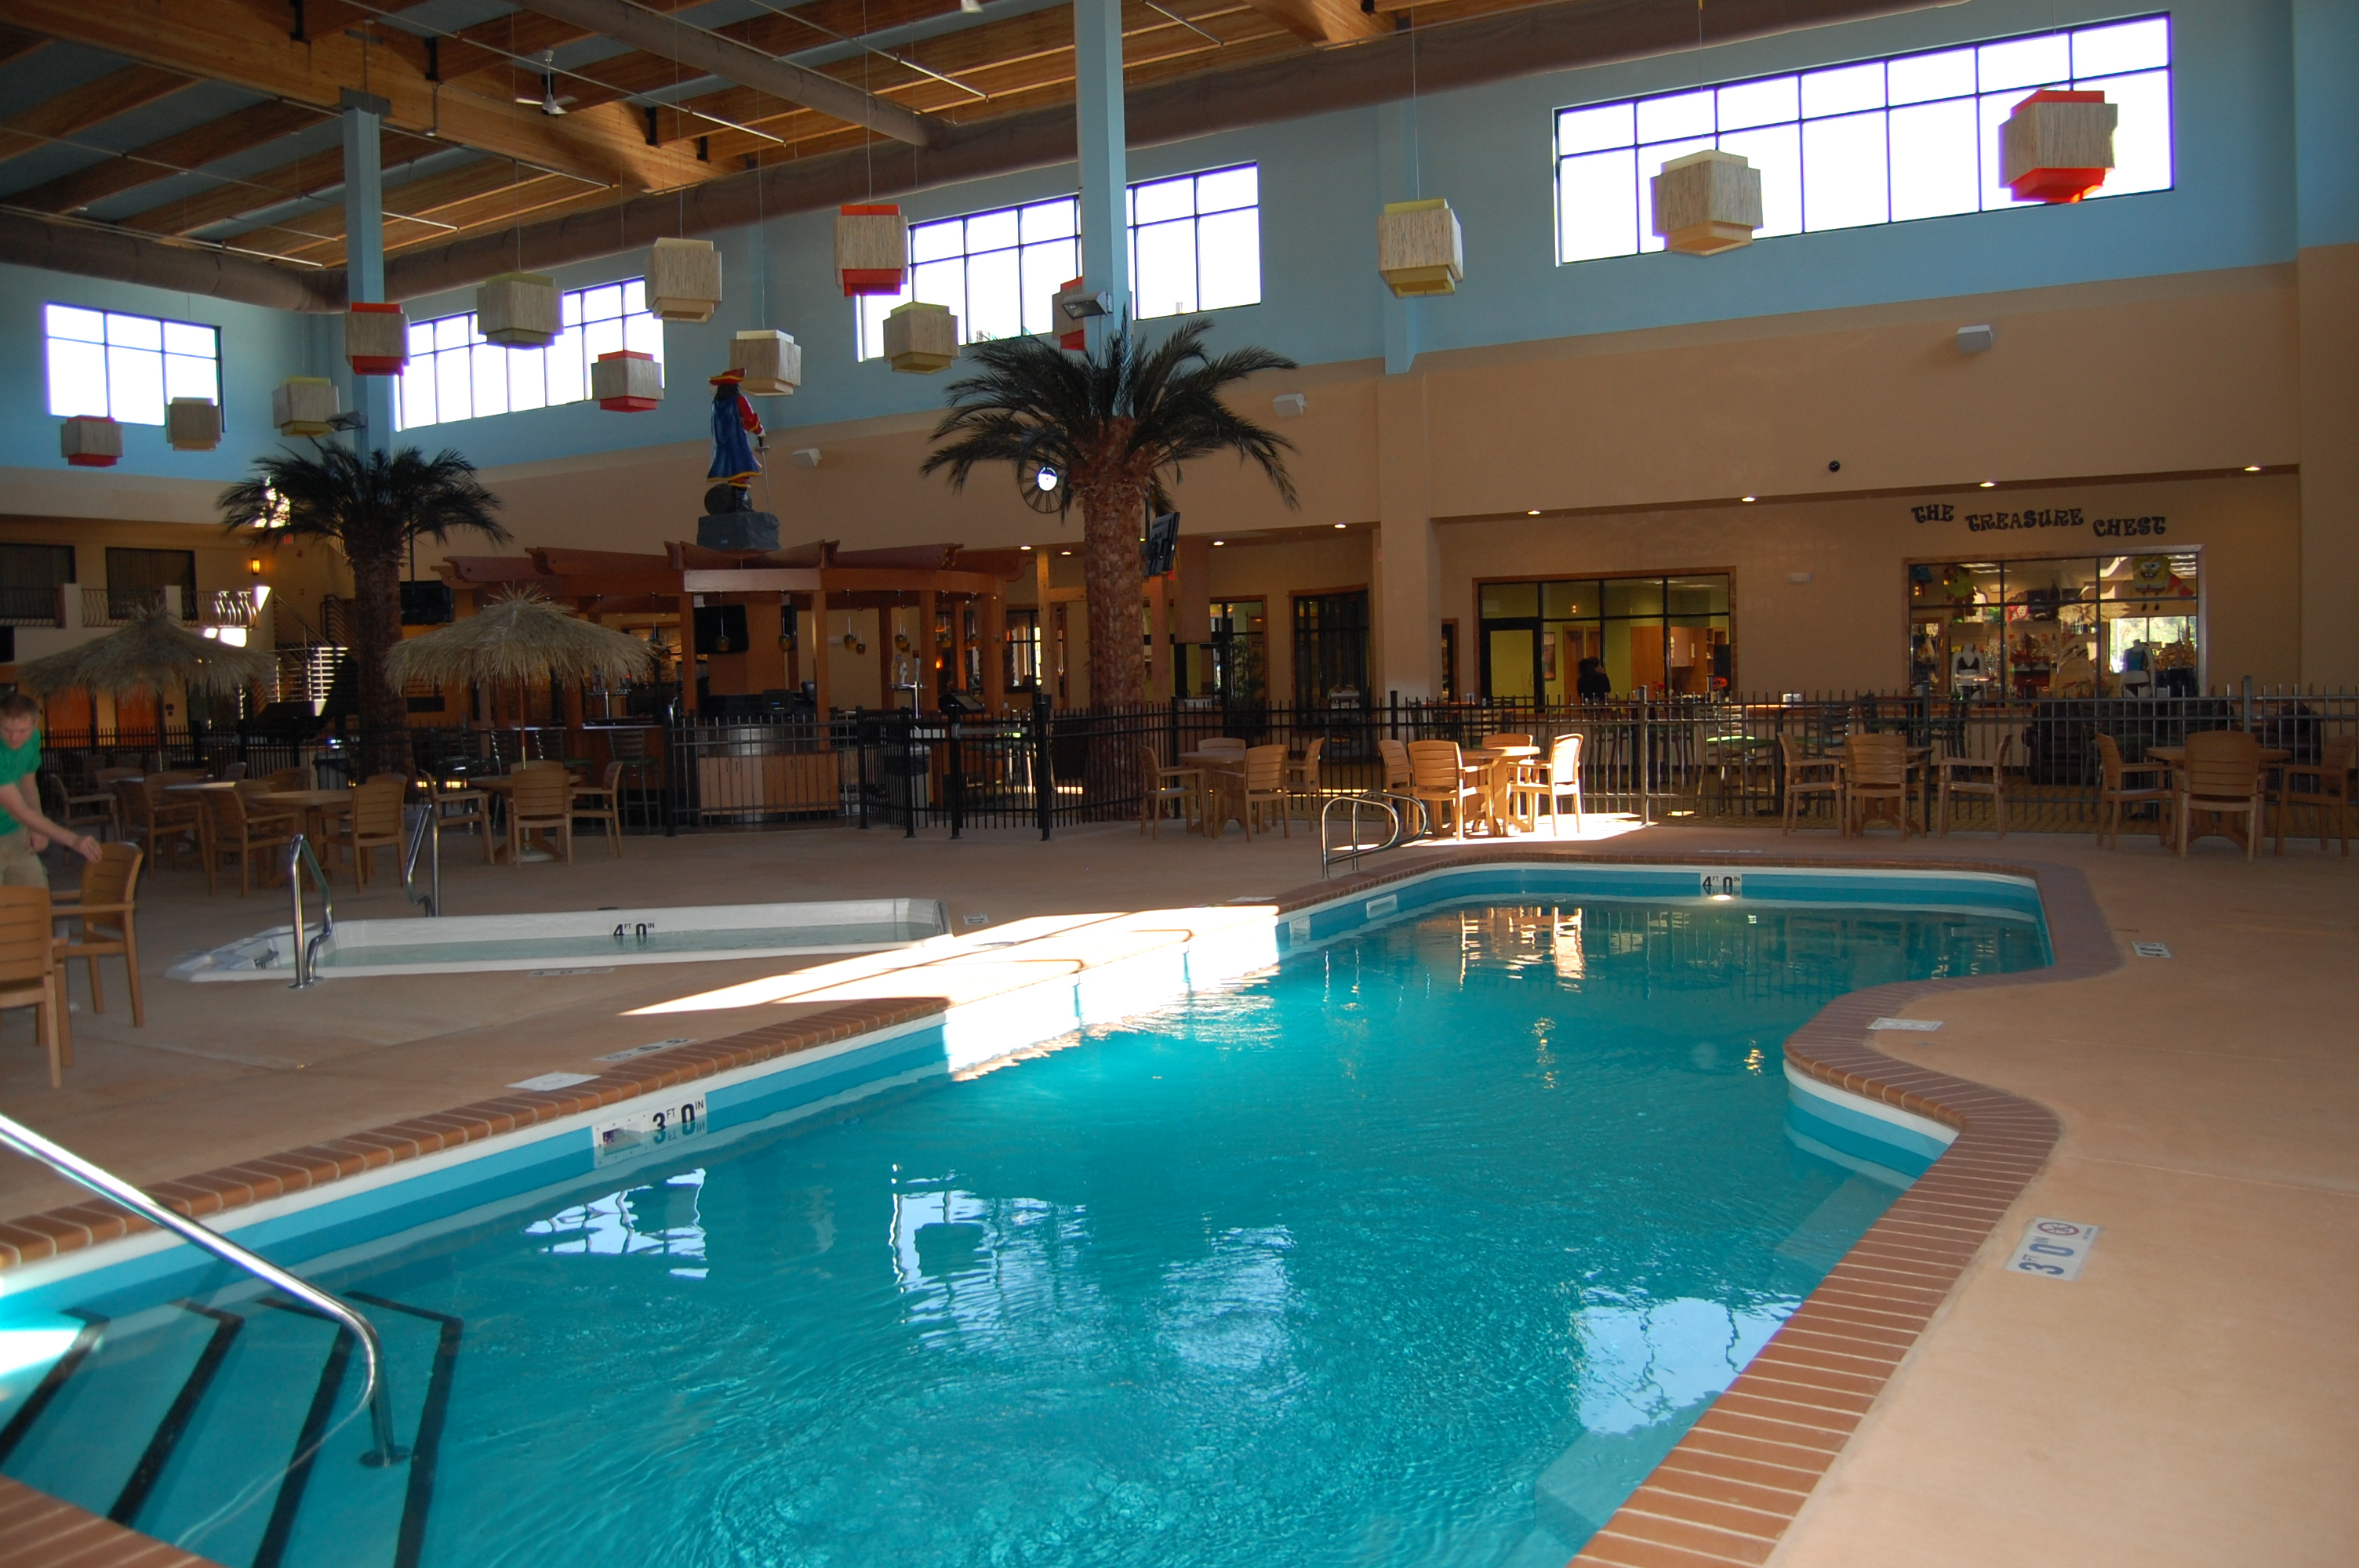 Ramada Tropics Resort Conference Center Des Moines Photo